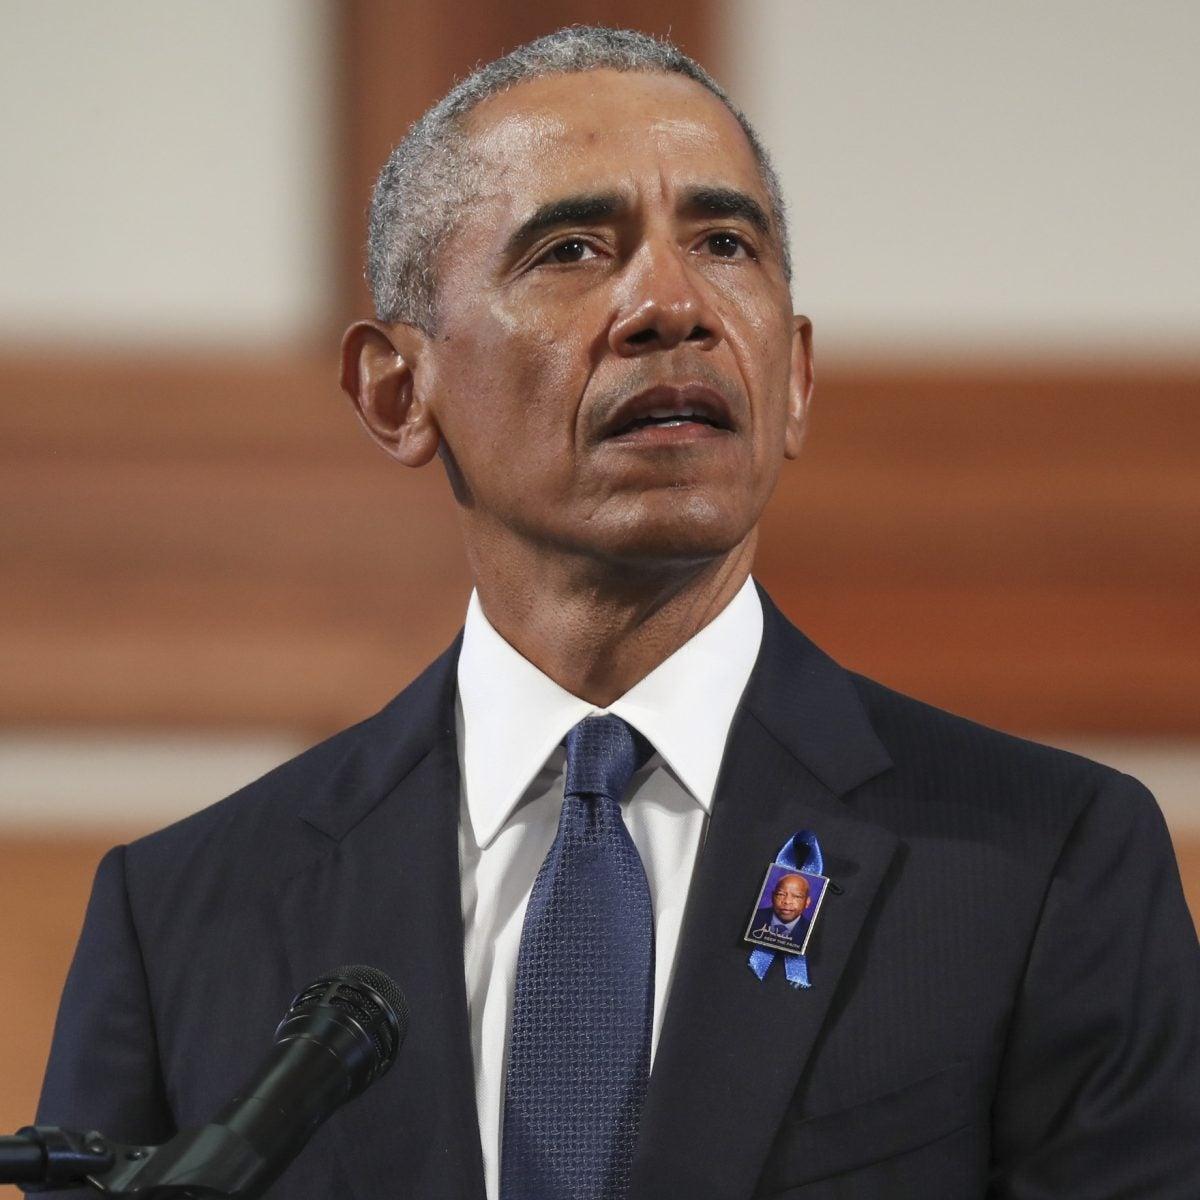 Barack Obama Says He Broke His Peer's Nose For Calling Him A Racial Slur